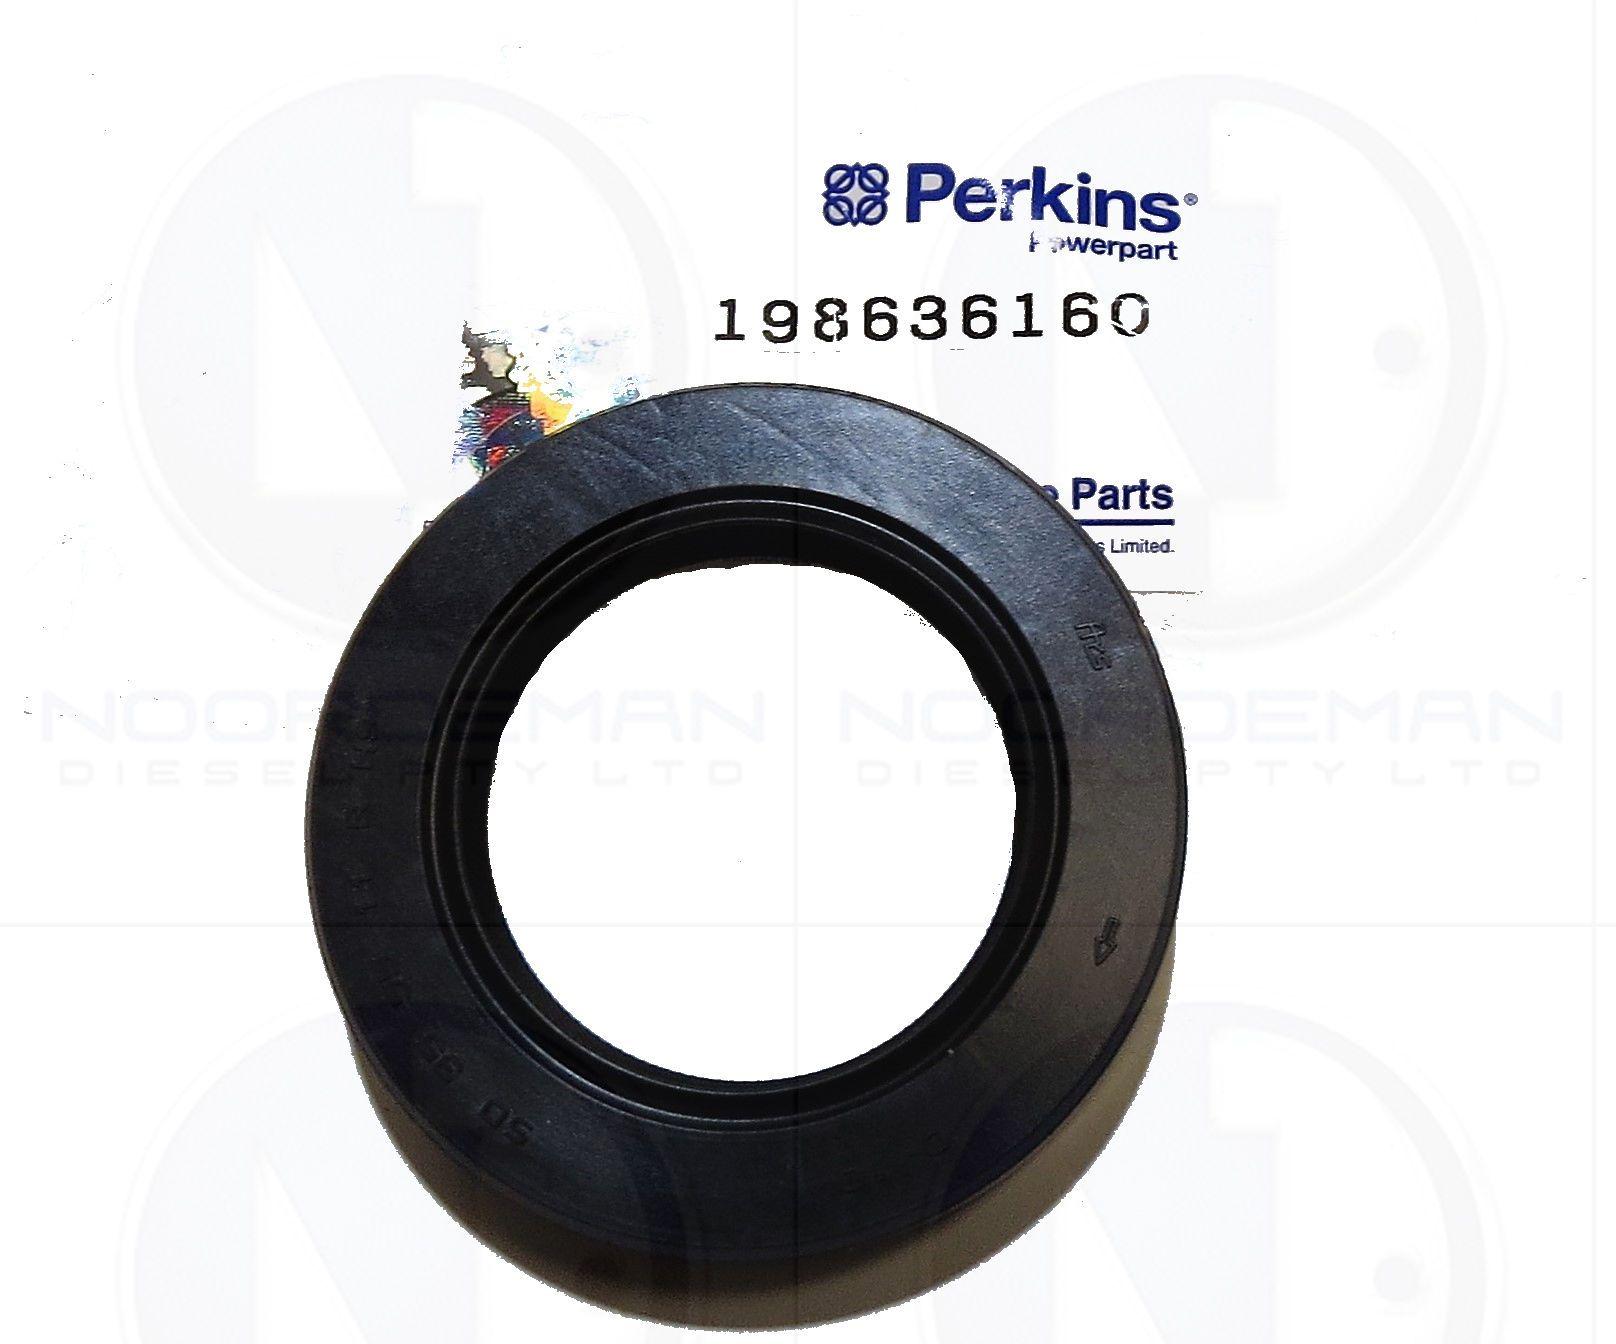 198636160 Perkins front seal